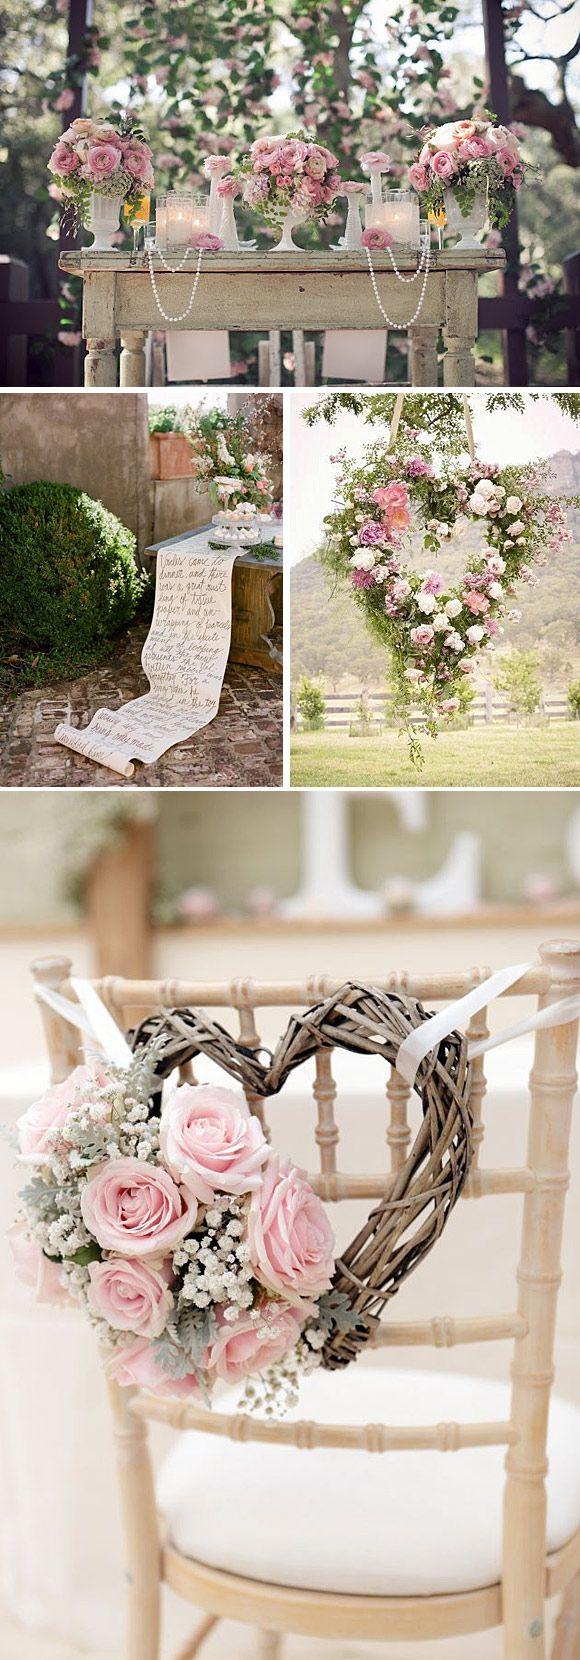 Matrimonio vintage y romántico 2